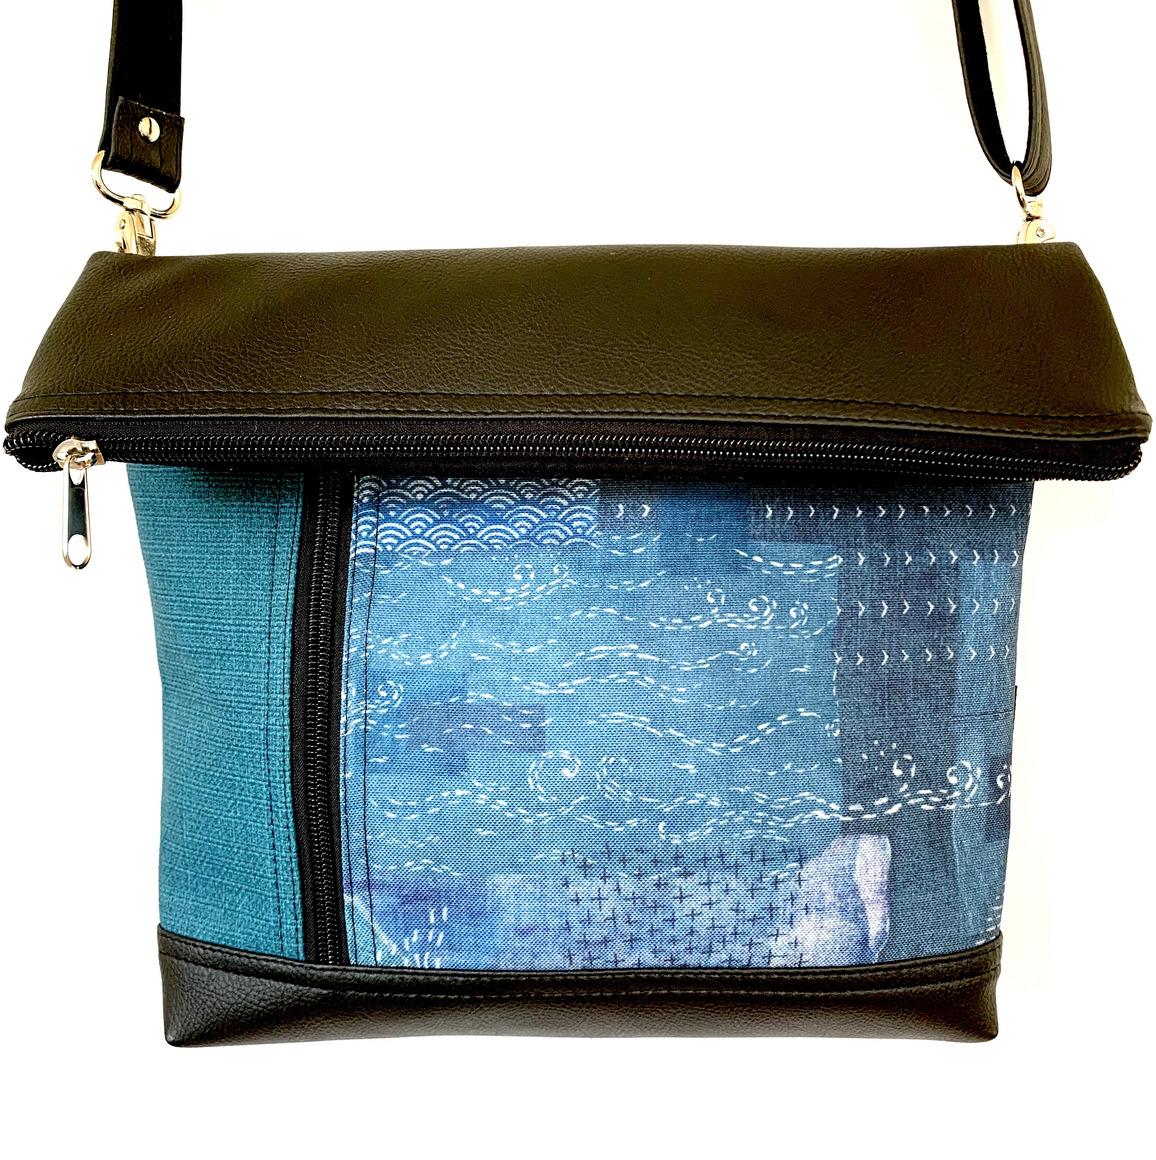 Inge Bag in Midnight | Trada Marketplace